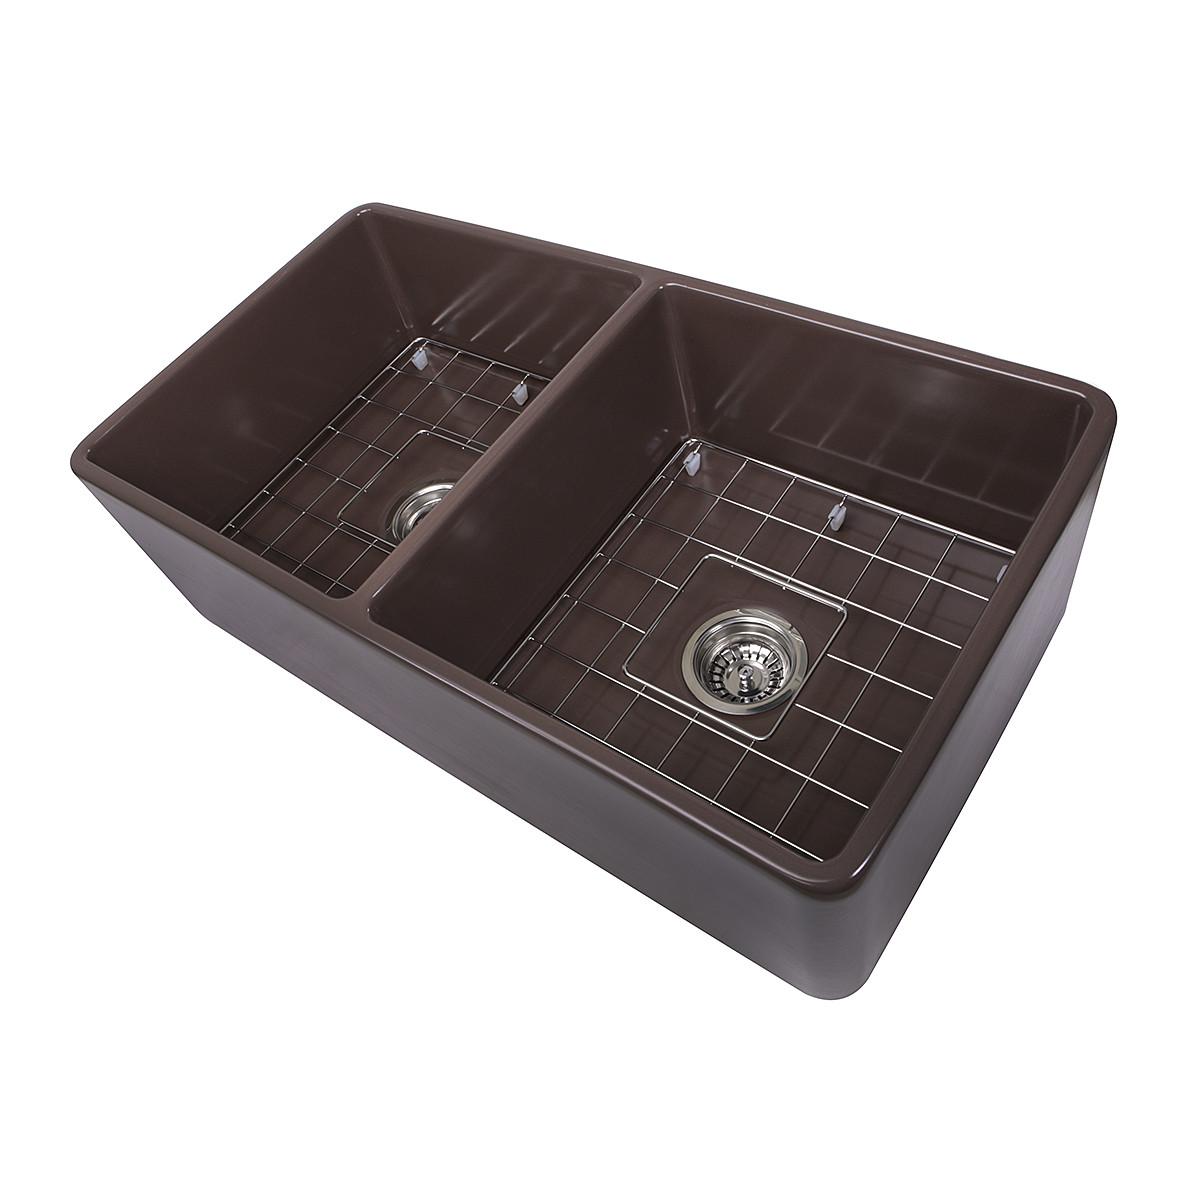 Nantucket Sinks T-FCFS33CB-DBL 33 Inch Double Bowl Coffee Brown Farmhouse Fireclay Kitchen Sink